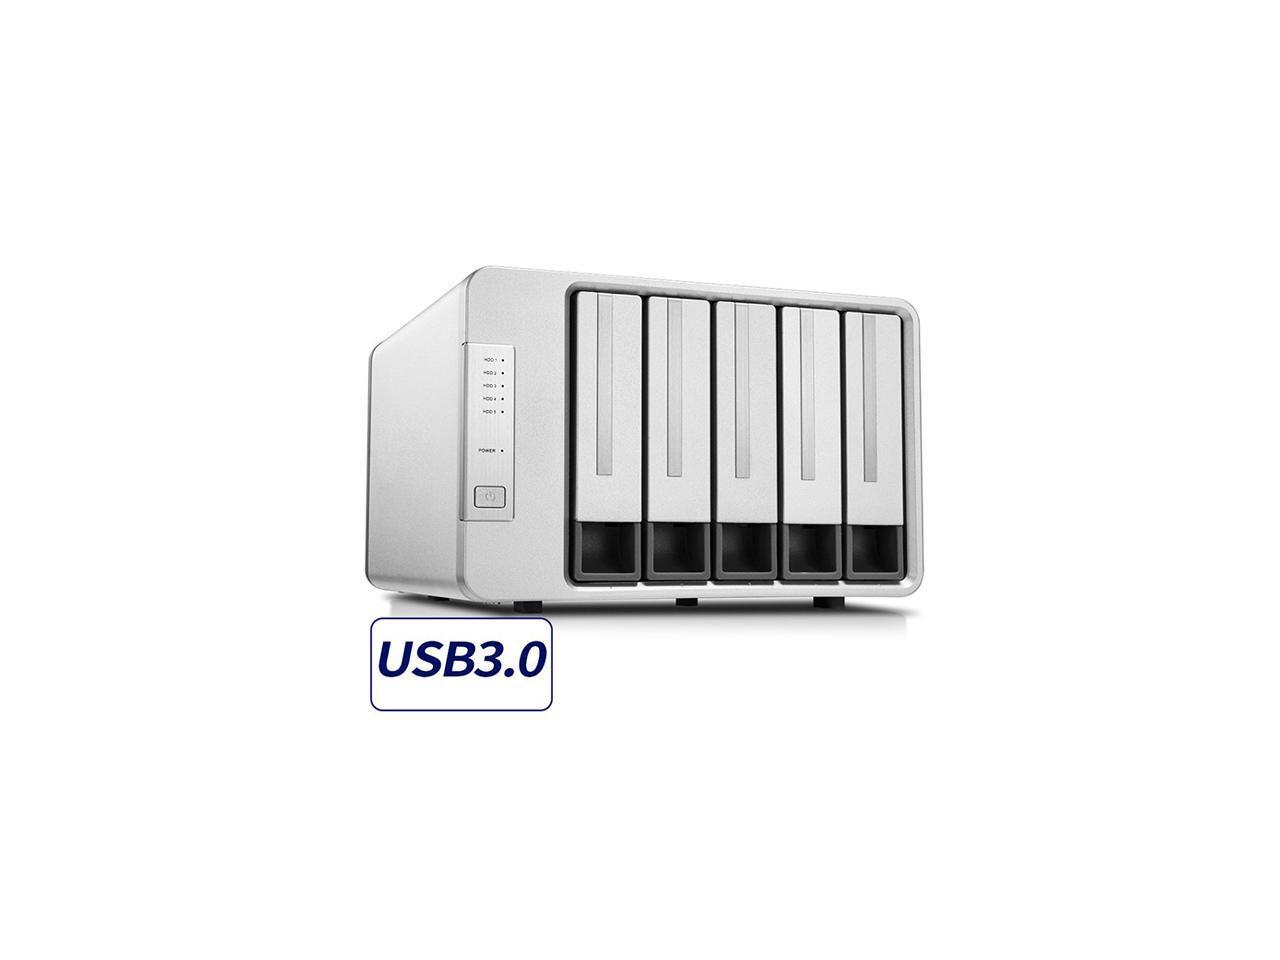 NOONTEC-TerraMaster D5-300 USB3.0 Type C 5-Bay Raid Enclosure USB3.0 (5Gbps) Support RAID 5 Hard Drive RAID Storage (Diskless) $159.99